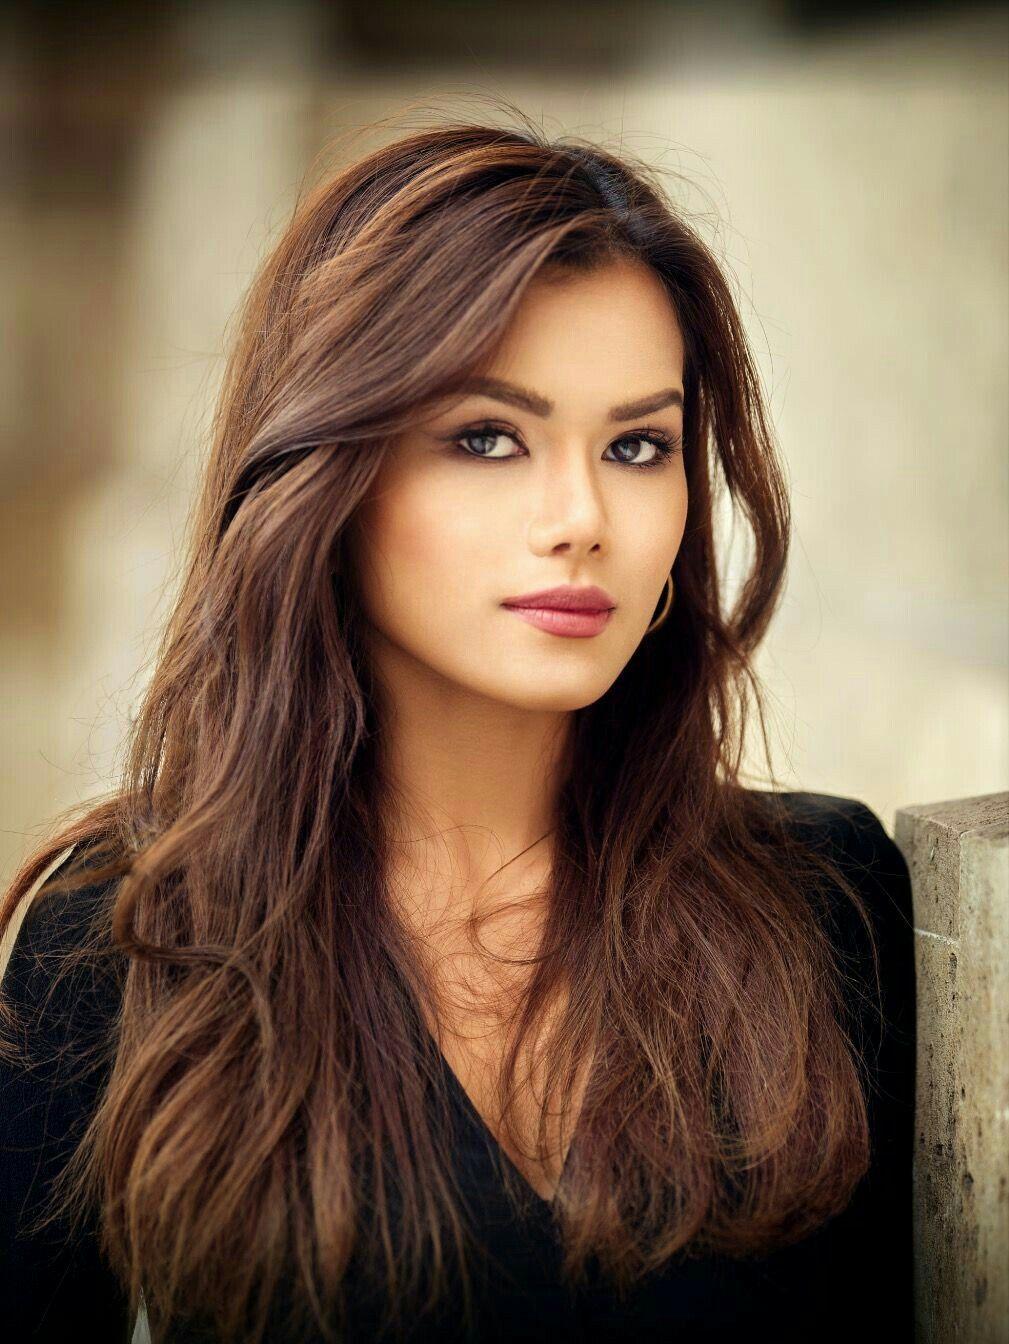 women are so beautiful